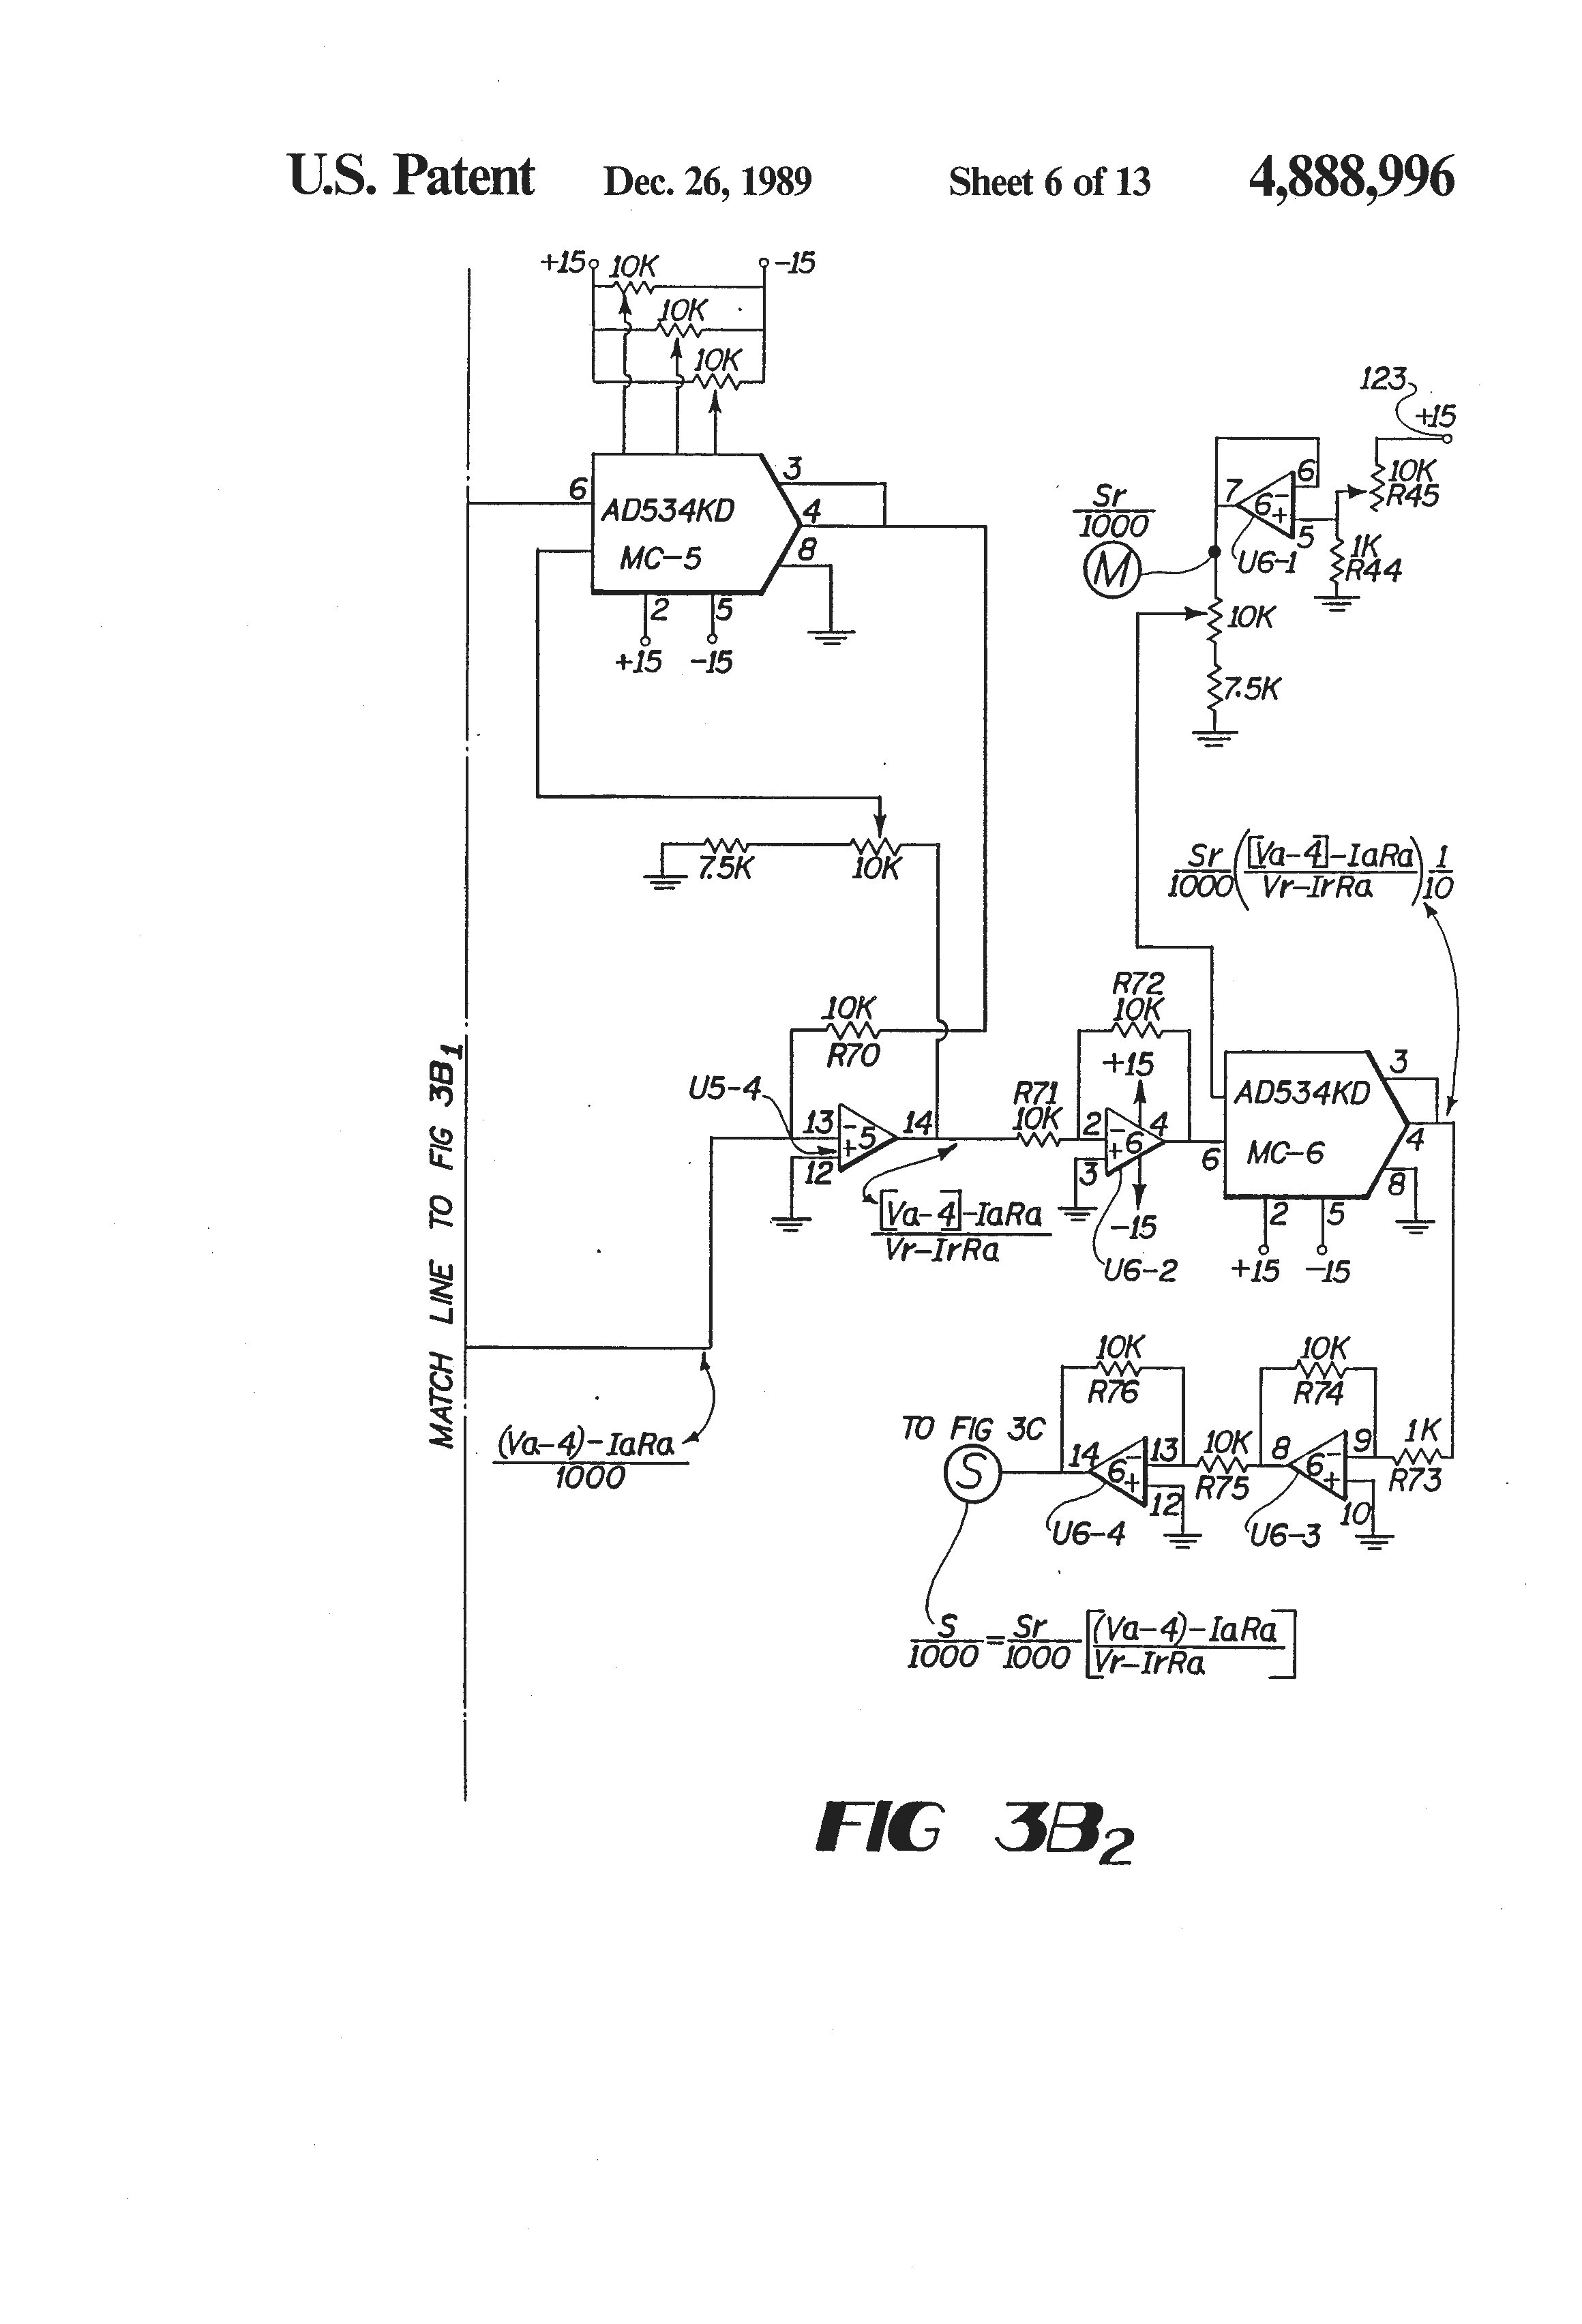 Square D Motor Control Center Wiring Diagram Best Square D Motor Starter Wiring Diagram Gallery Everything You Of Square D Motor Control Center Wiring Diagram